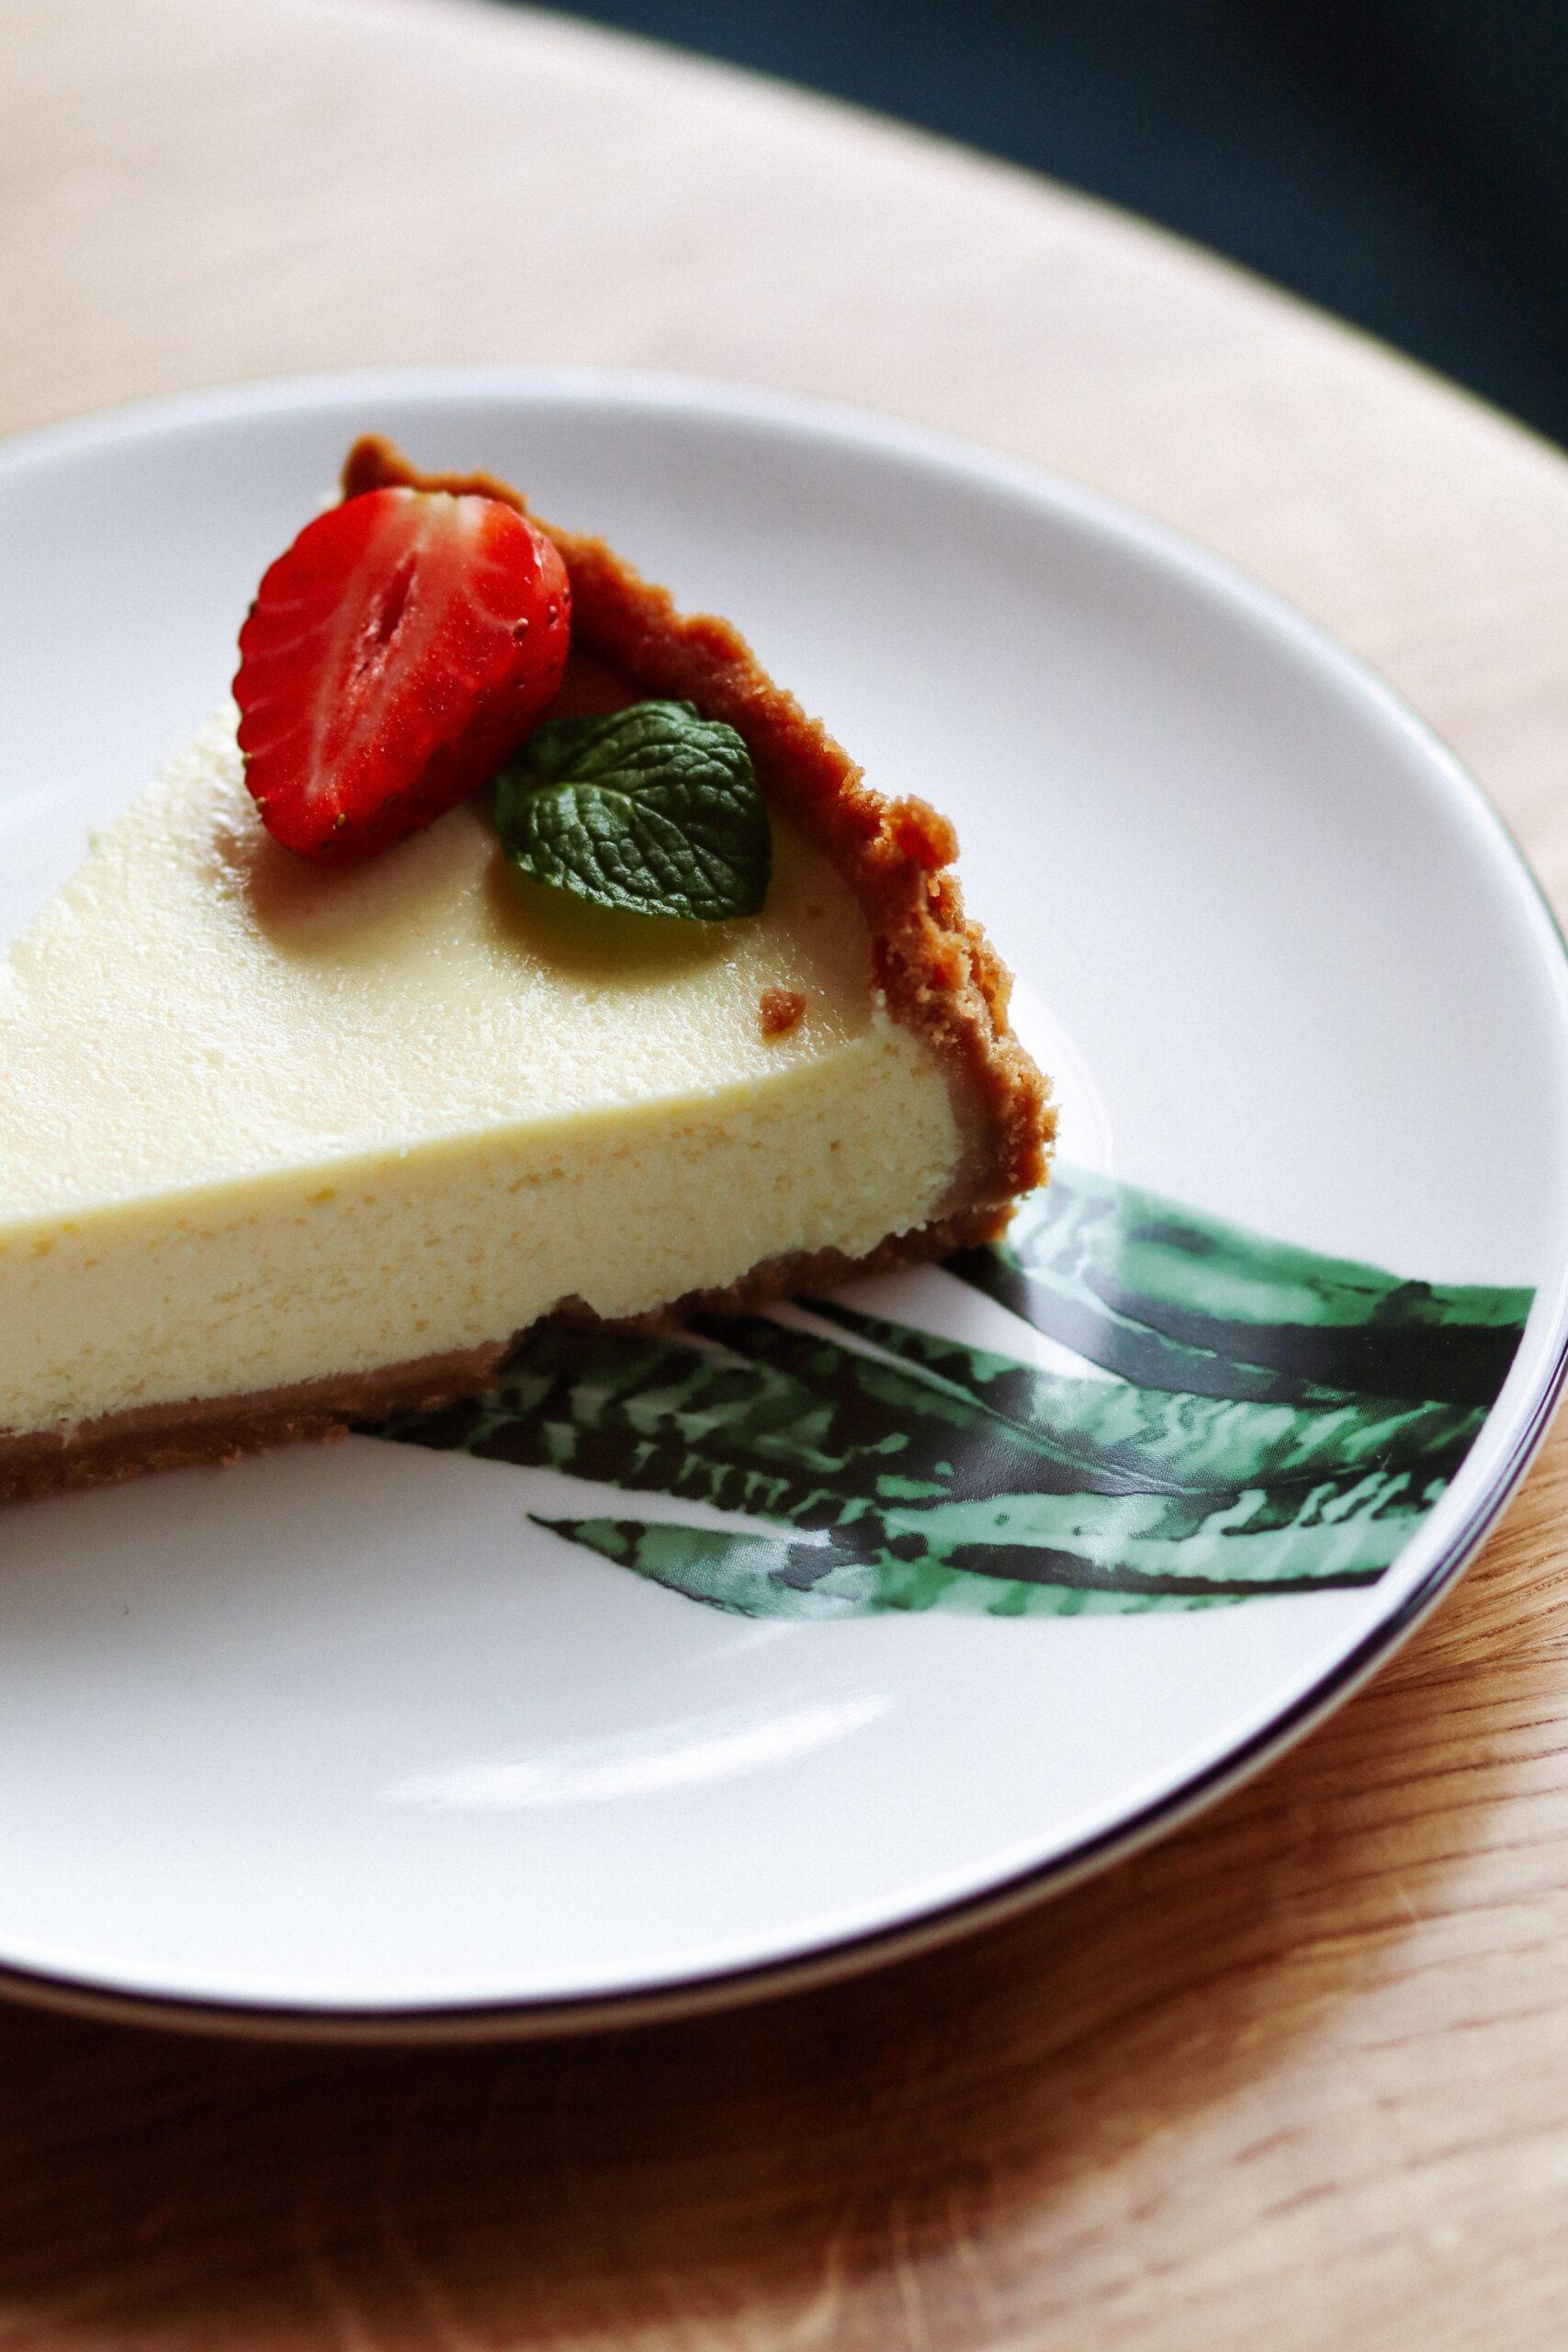 cheesecake taisiia-shestopal-4o78jEII3nU-unsplash